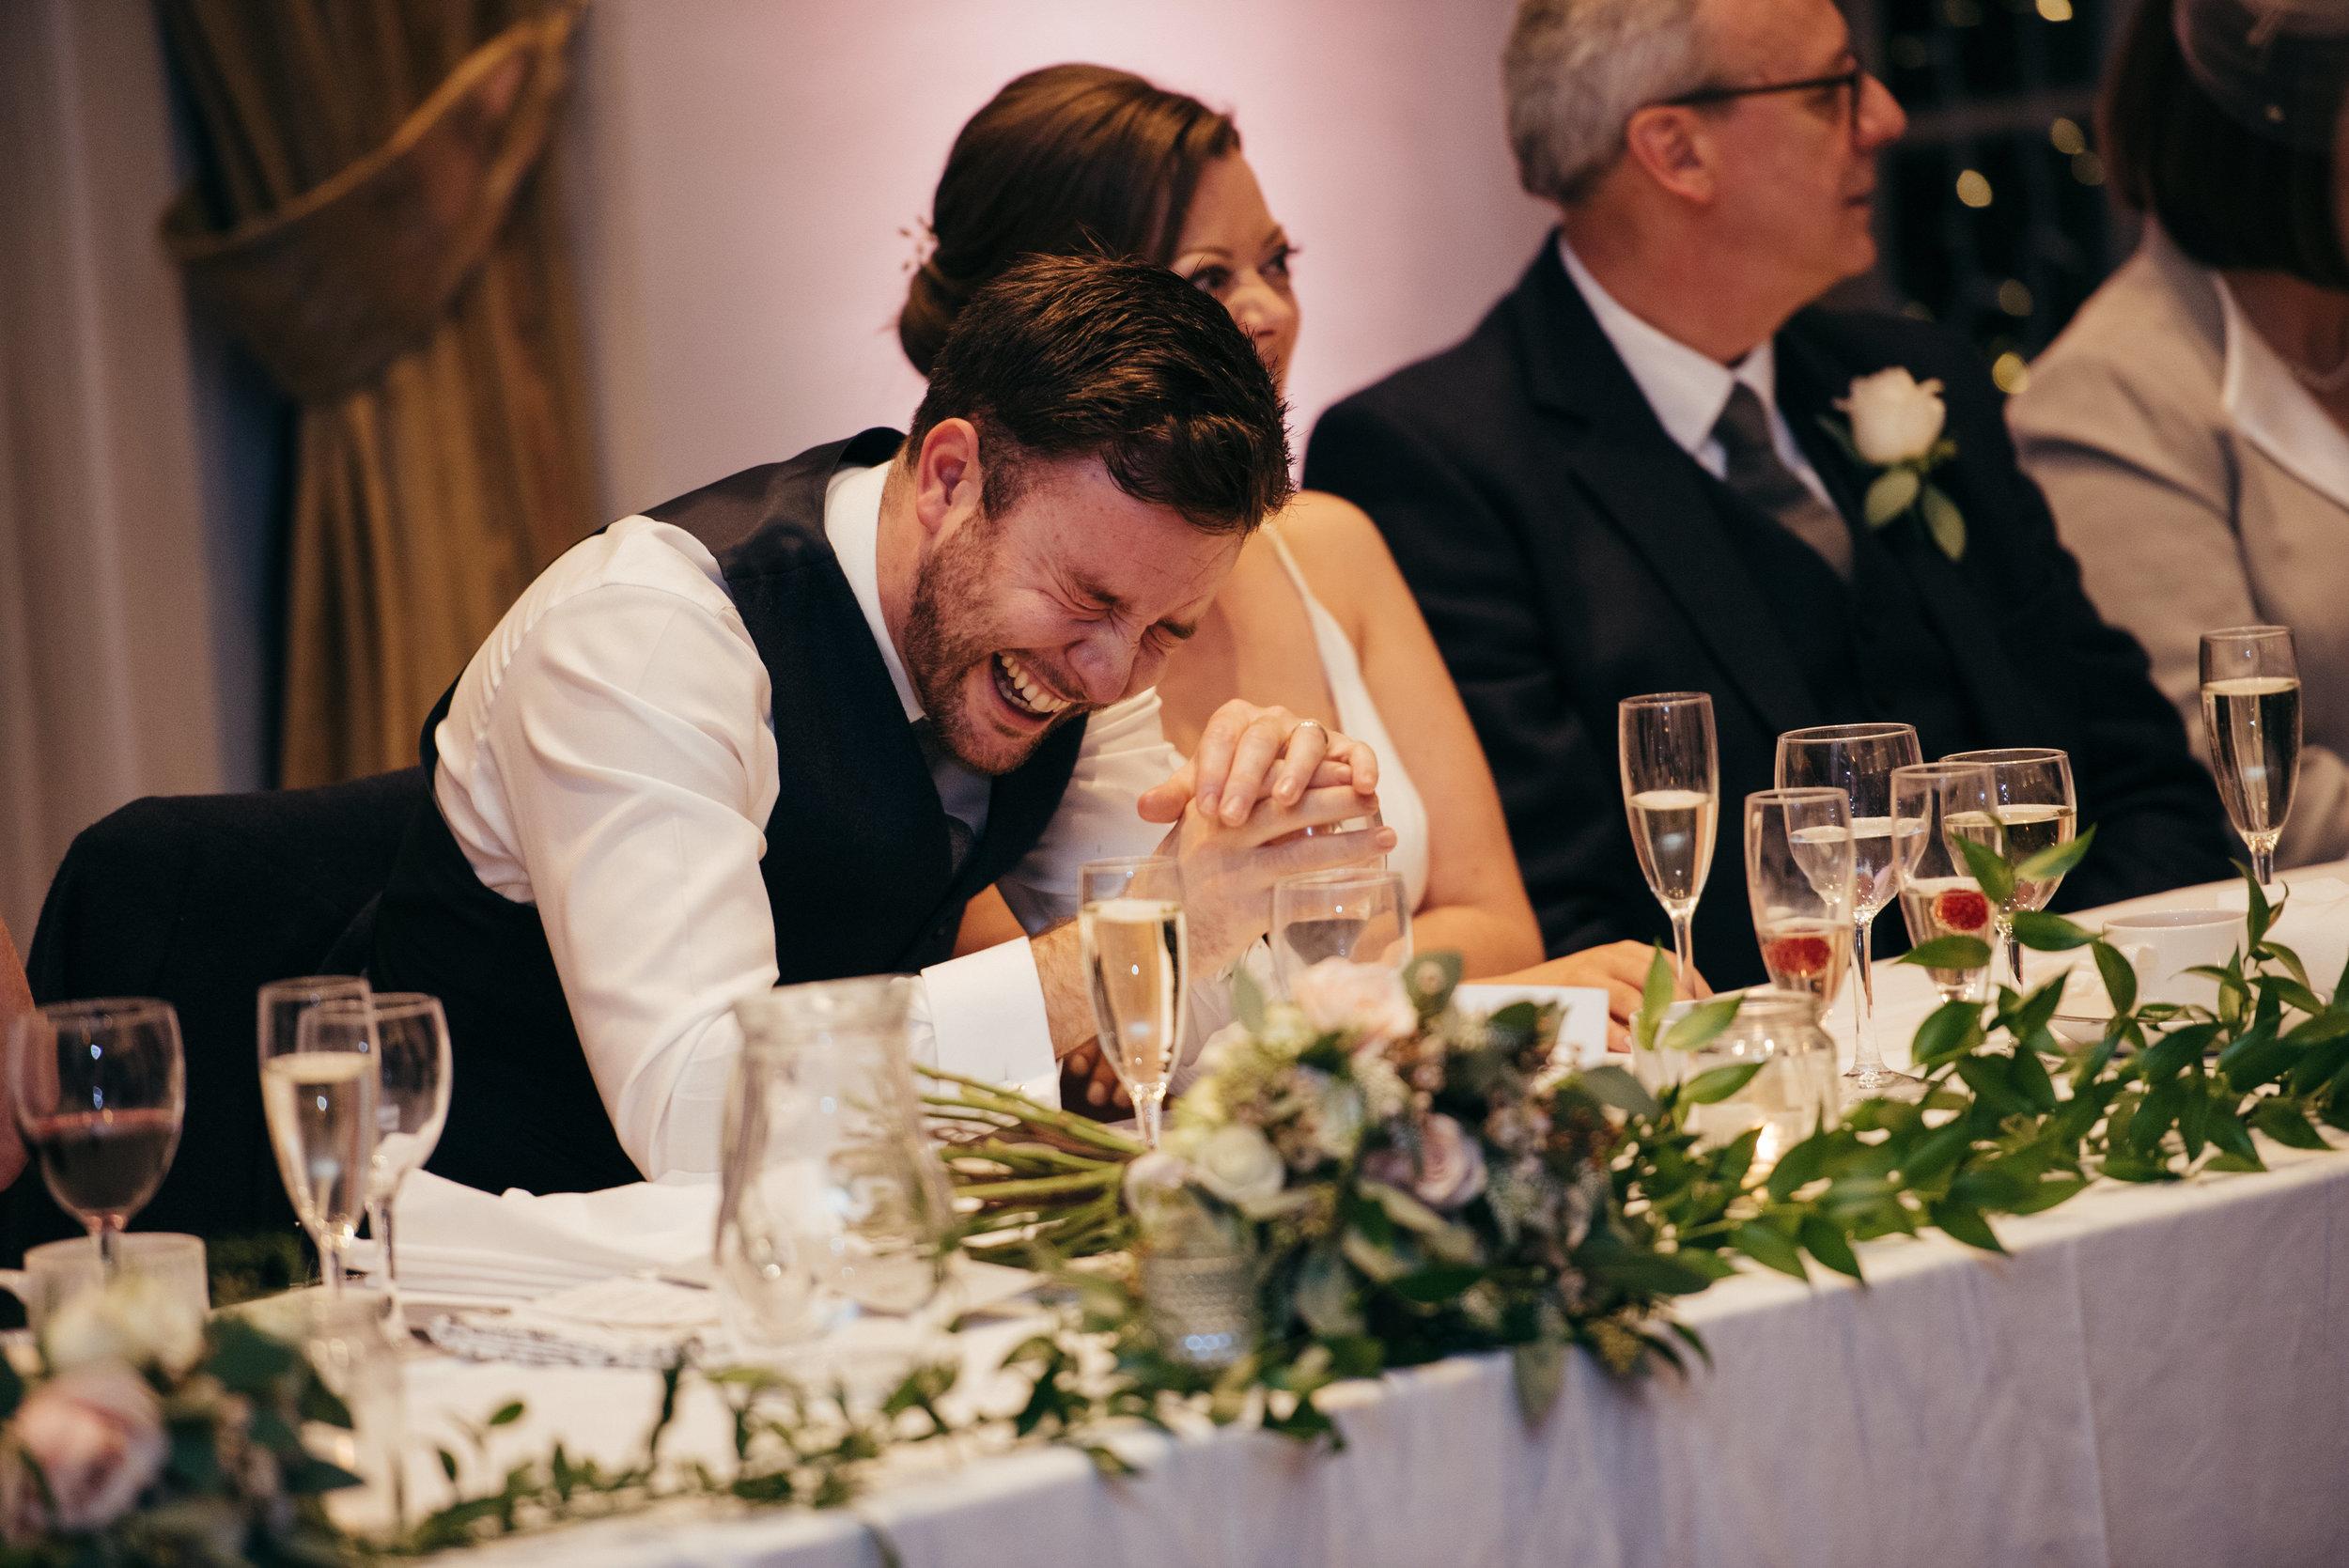 S&D(wedding)642.jpg